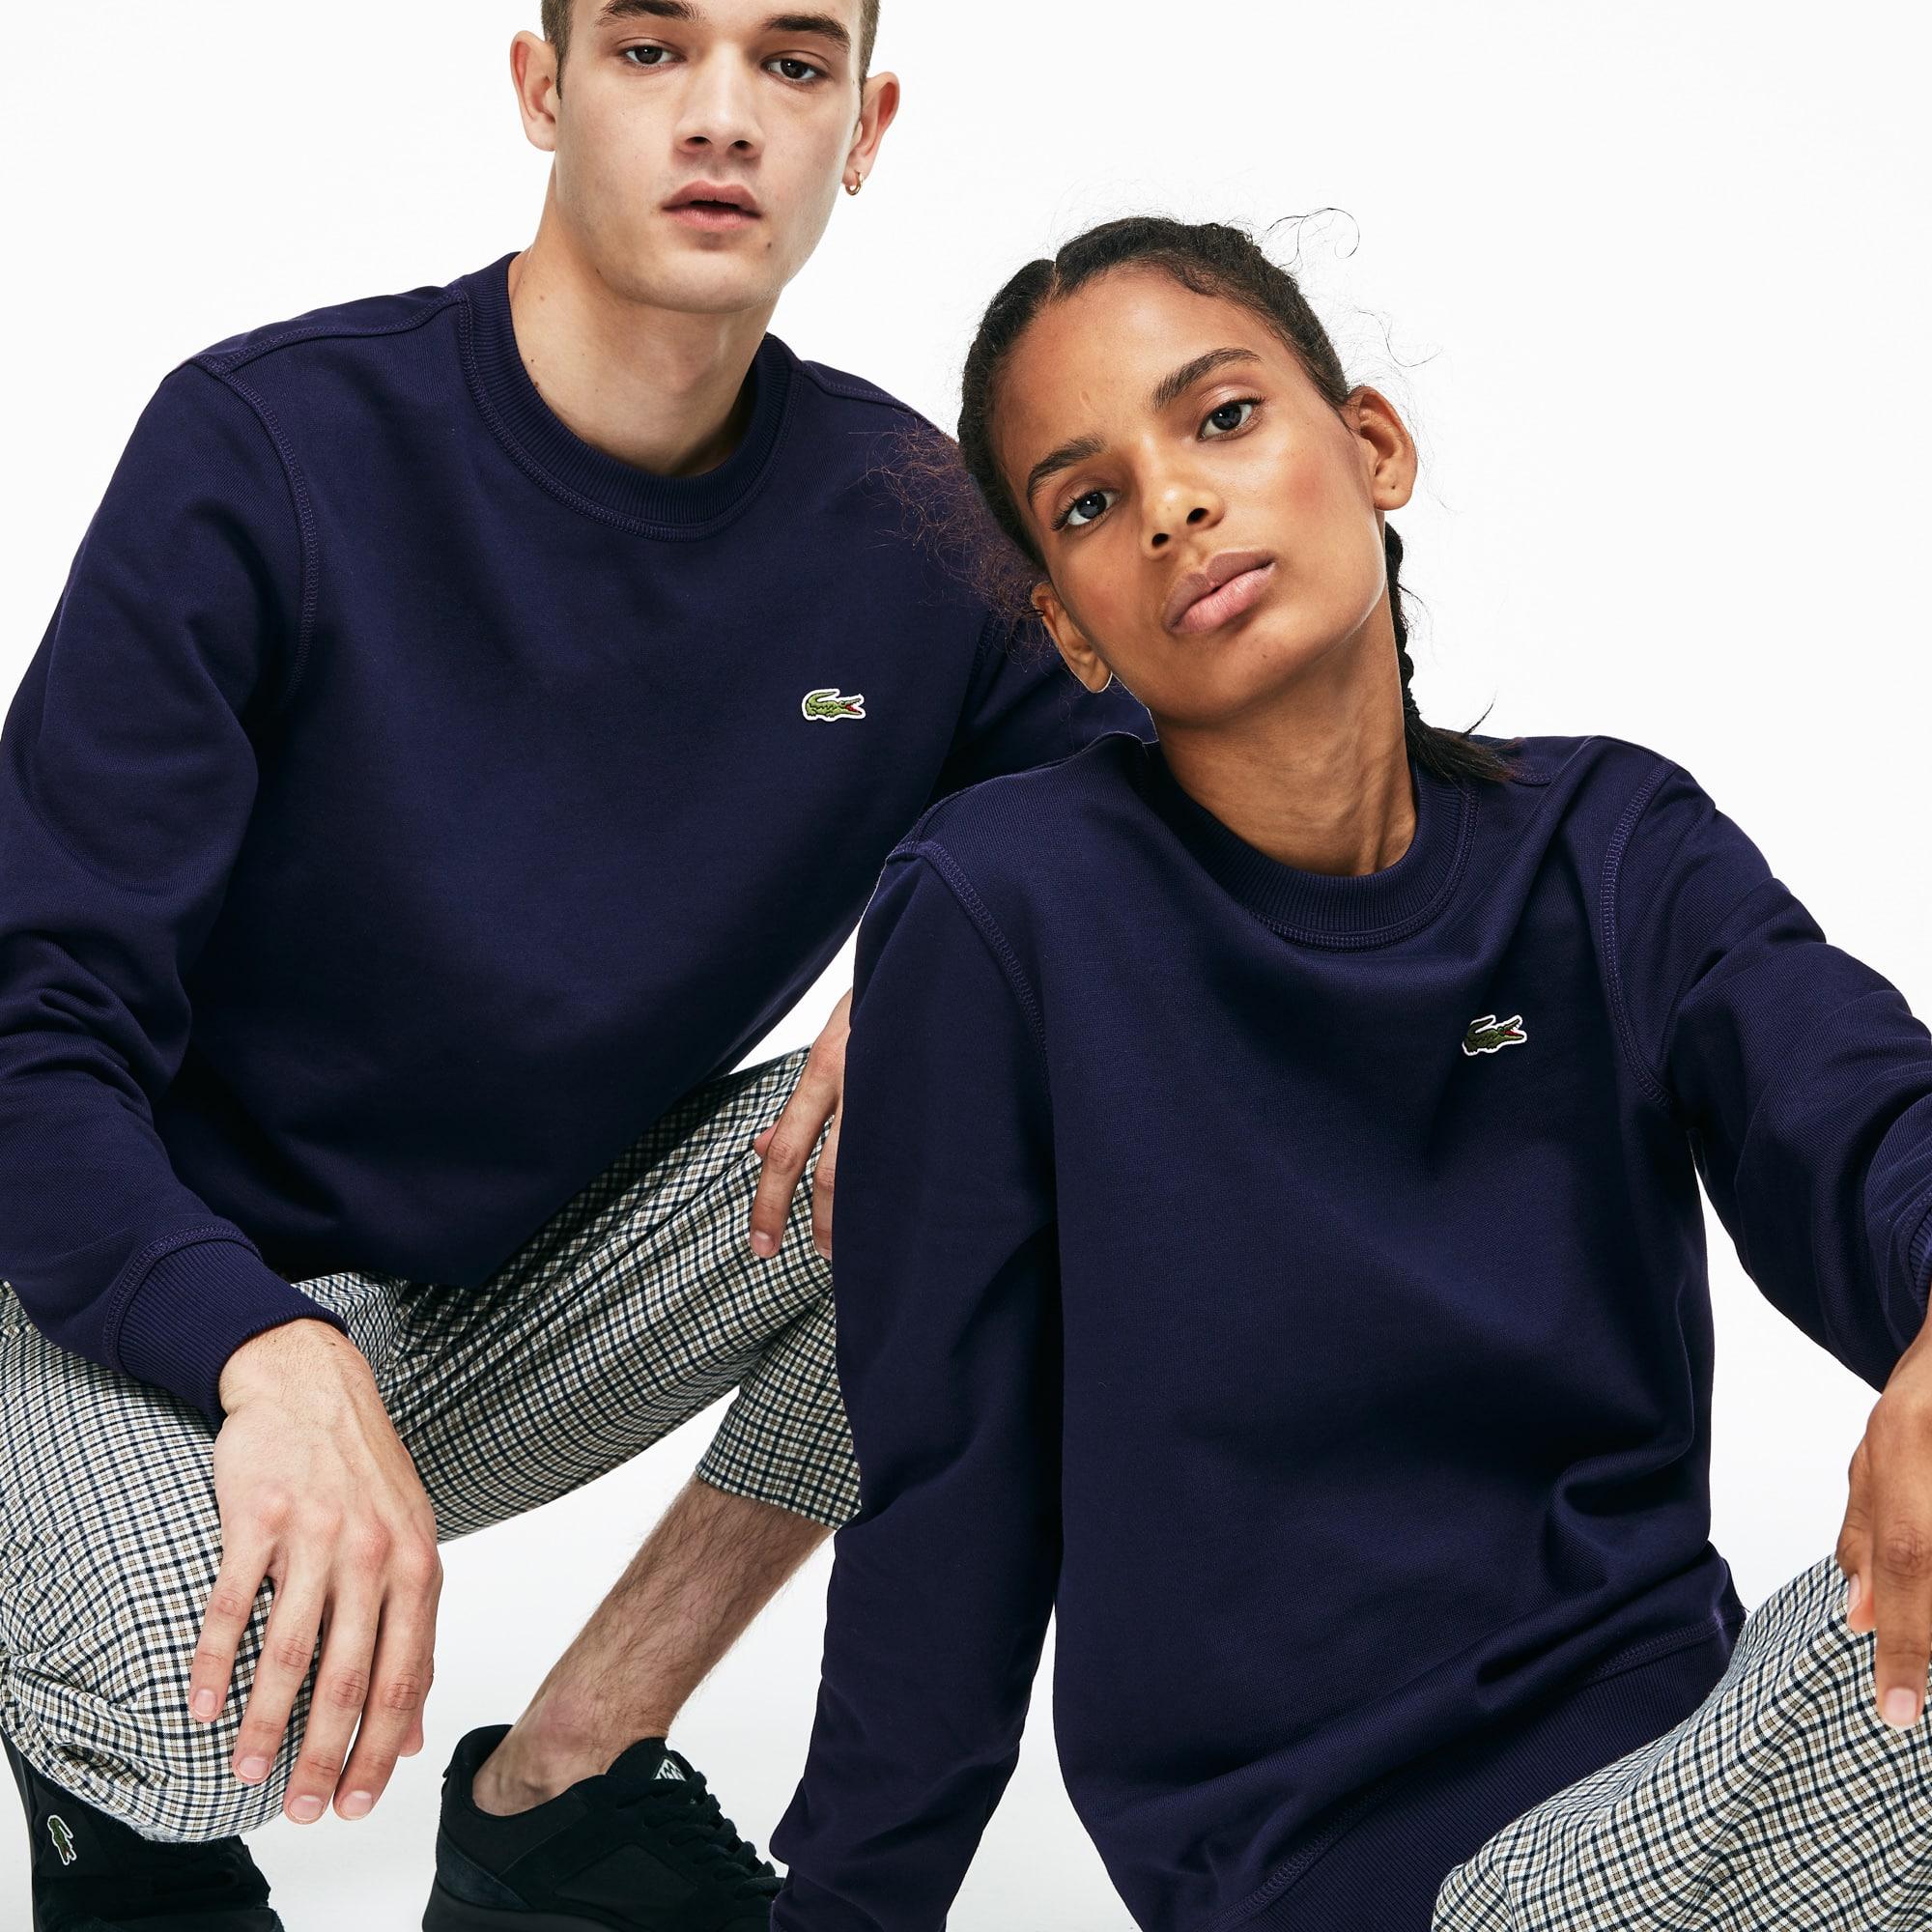 Unisex Lacoste LIVE Crew Neck Cotton Fleece Sweatshirt